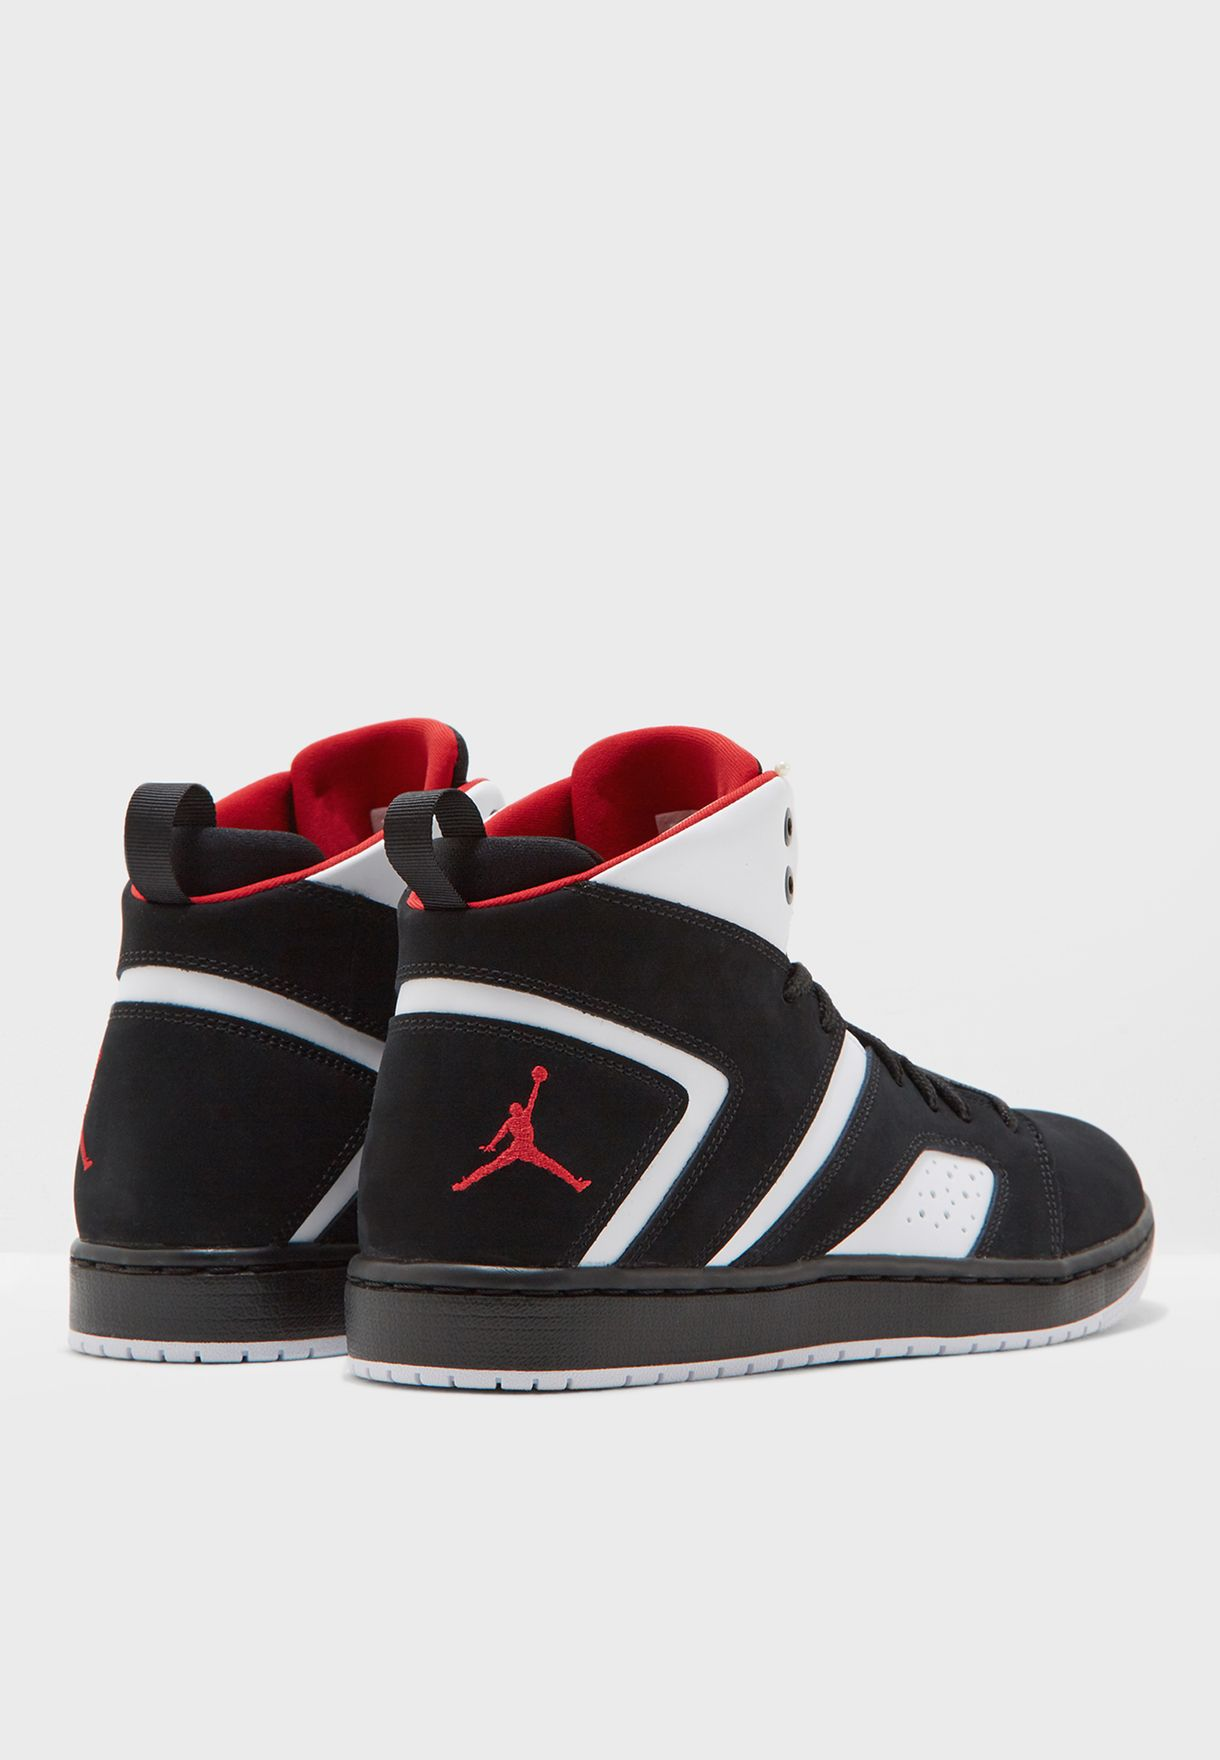 sports shoes 9aba4 22b64 Jordan Flight Legend